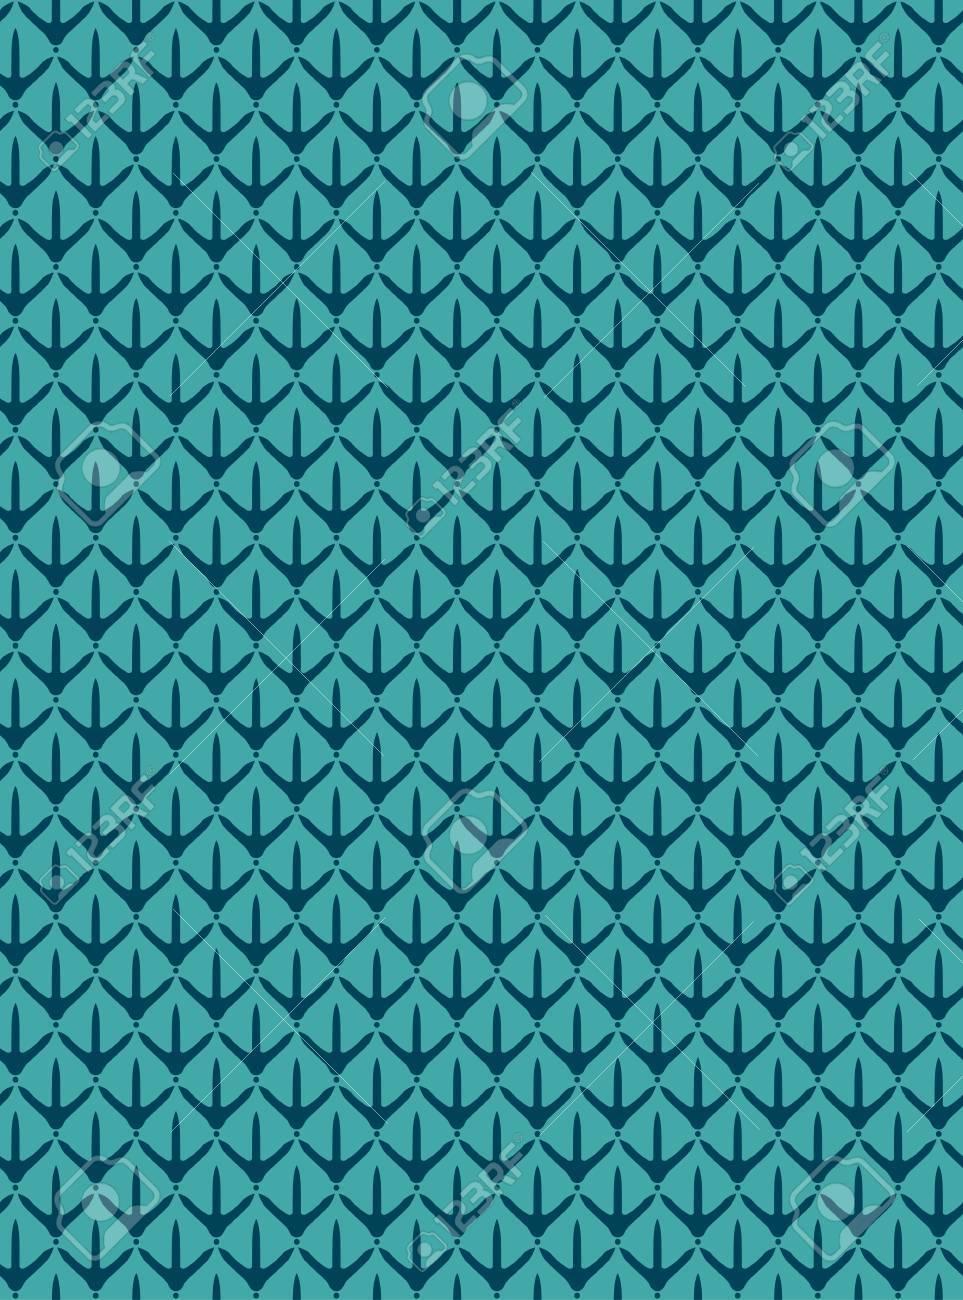 Chicken Paw Seamless Pattern Printing On Fabric Wallpaper